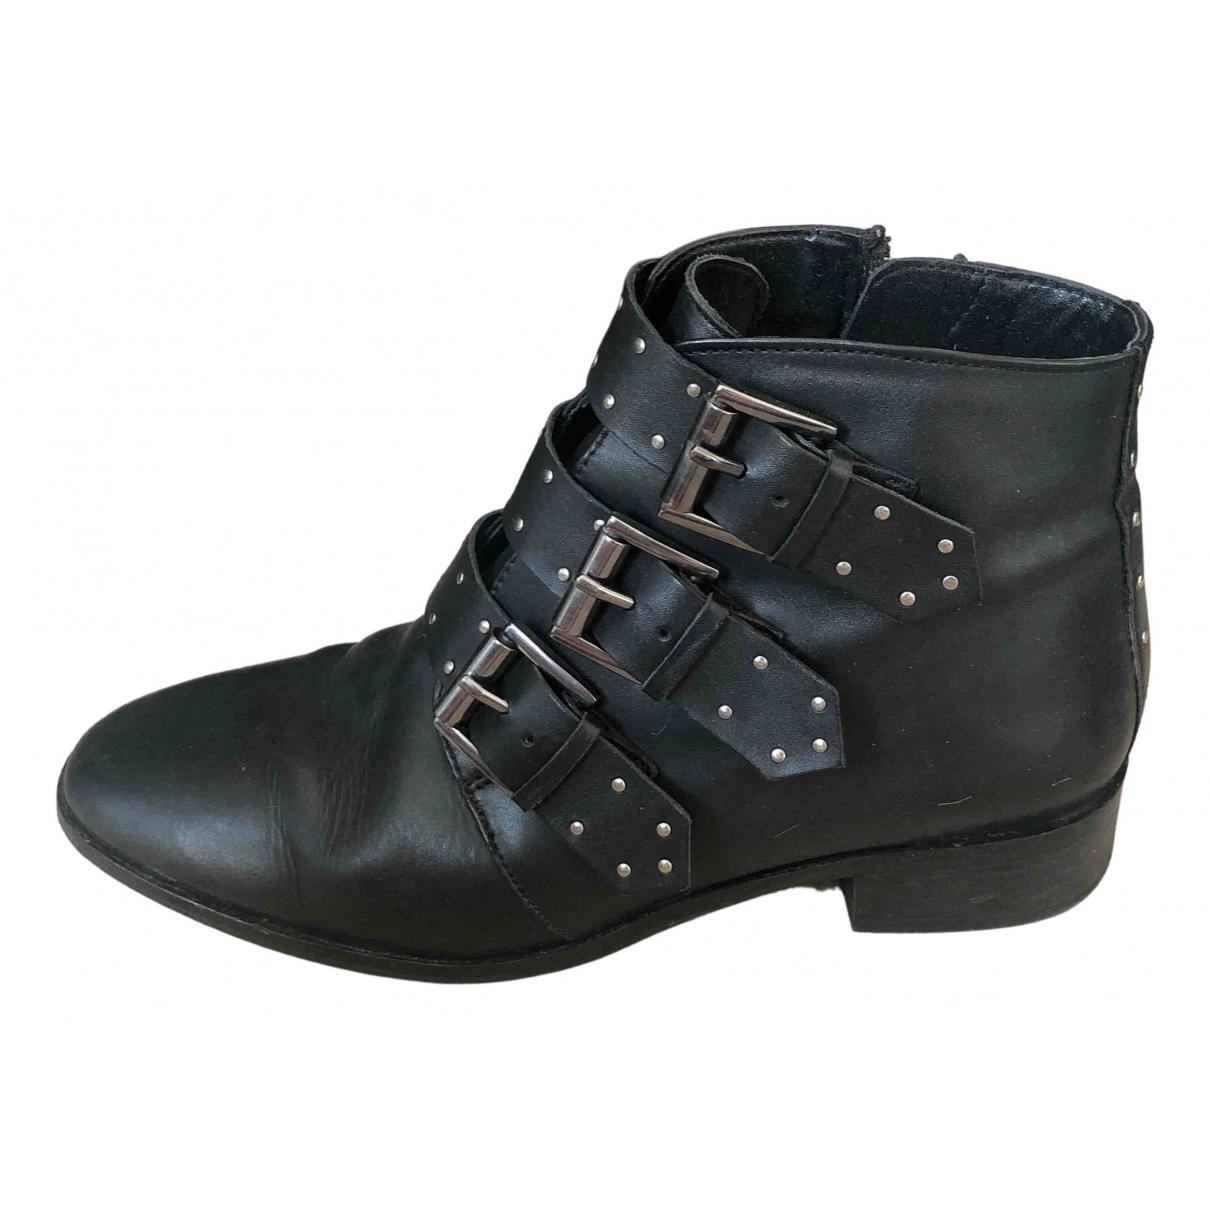 Asos \N Stiefel in  Schwarz Leder